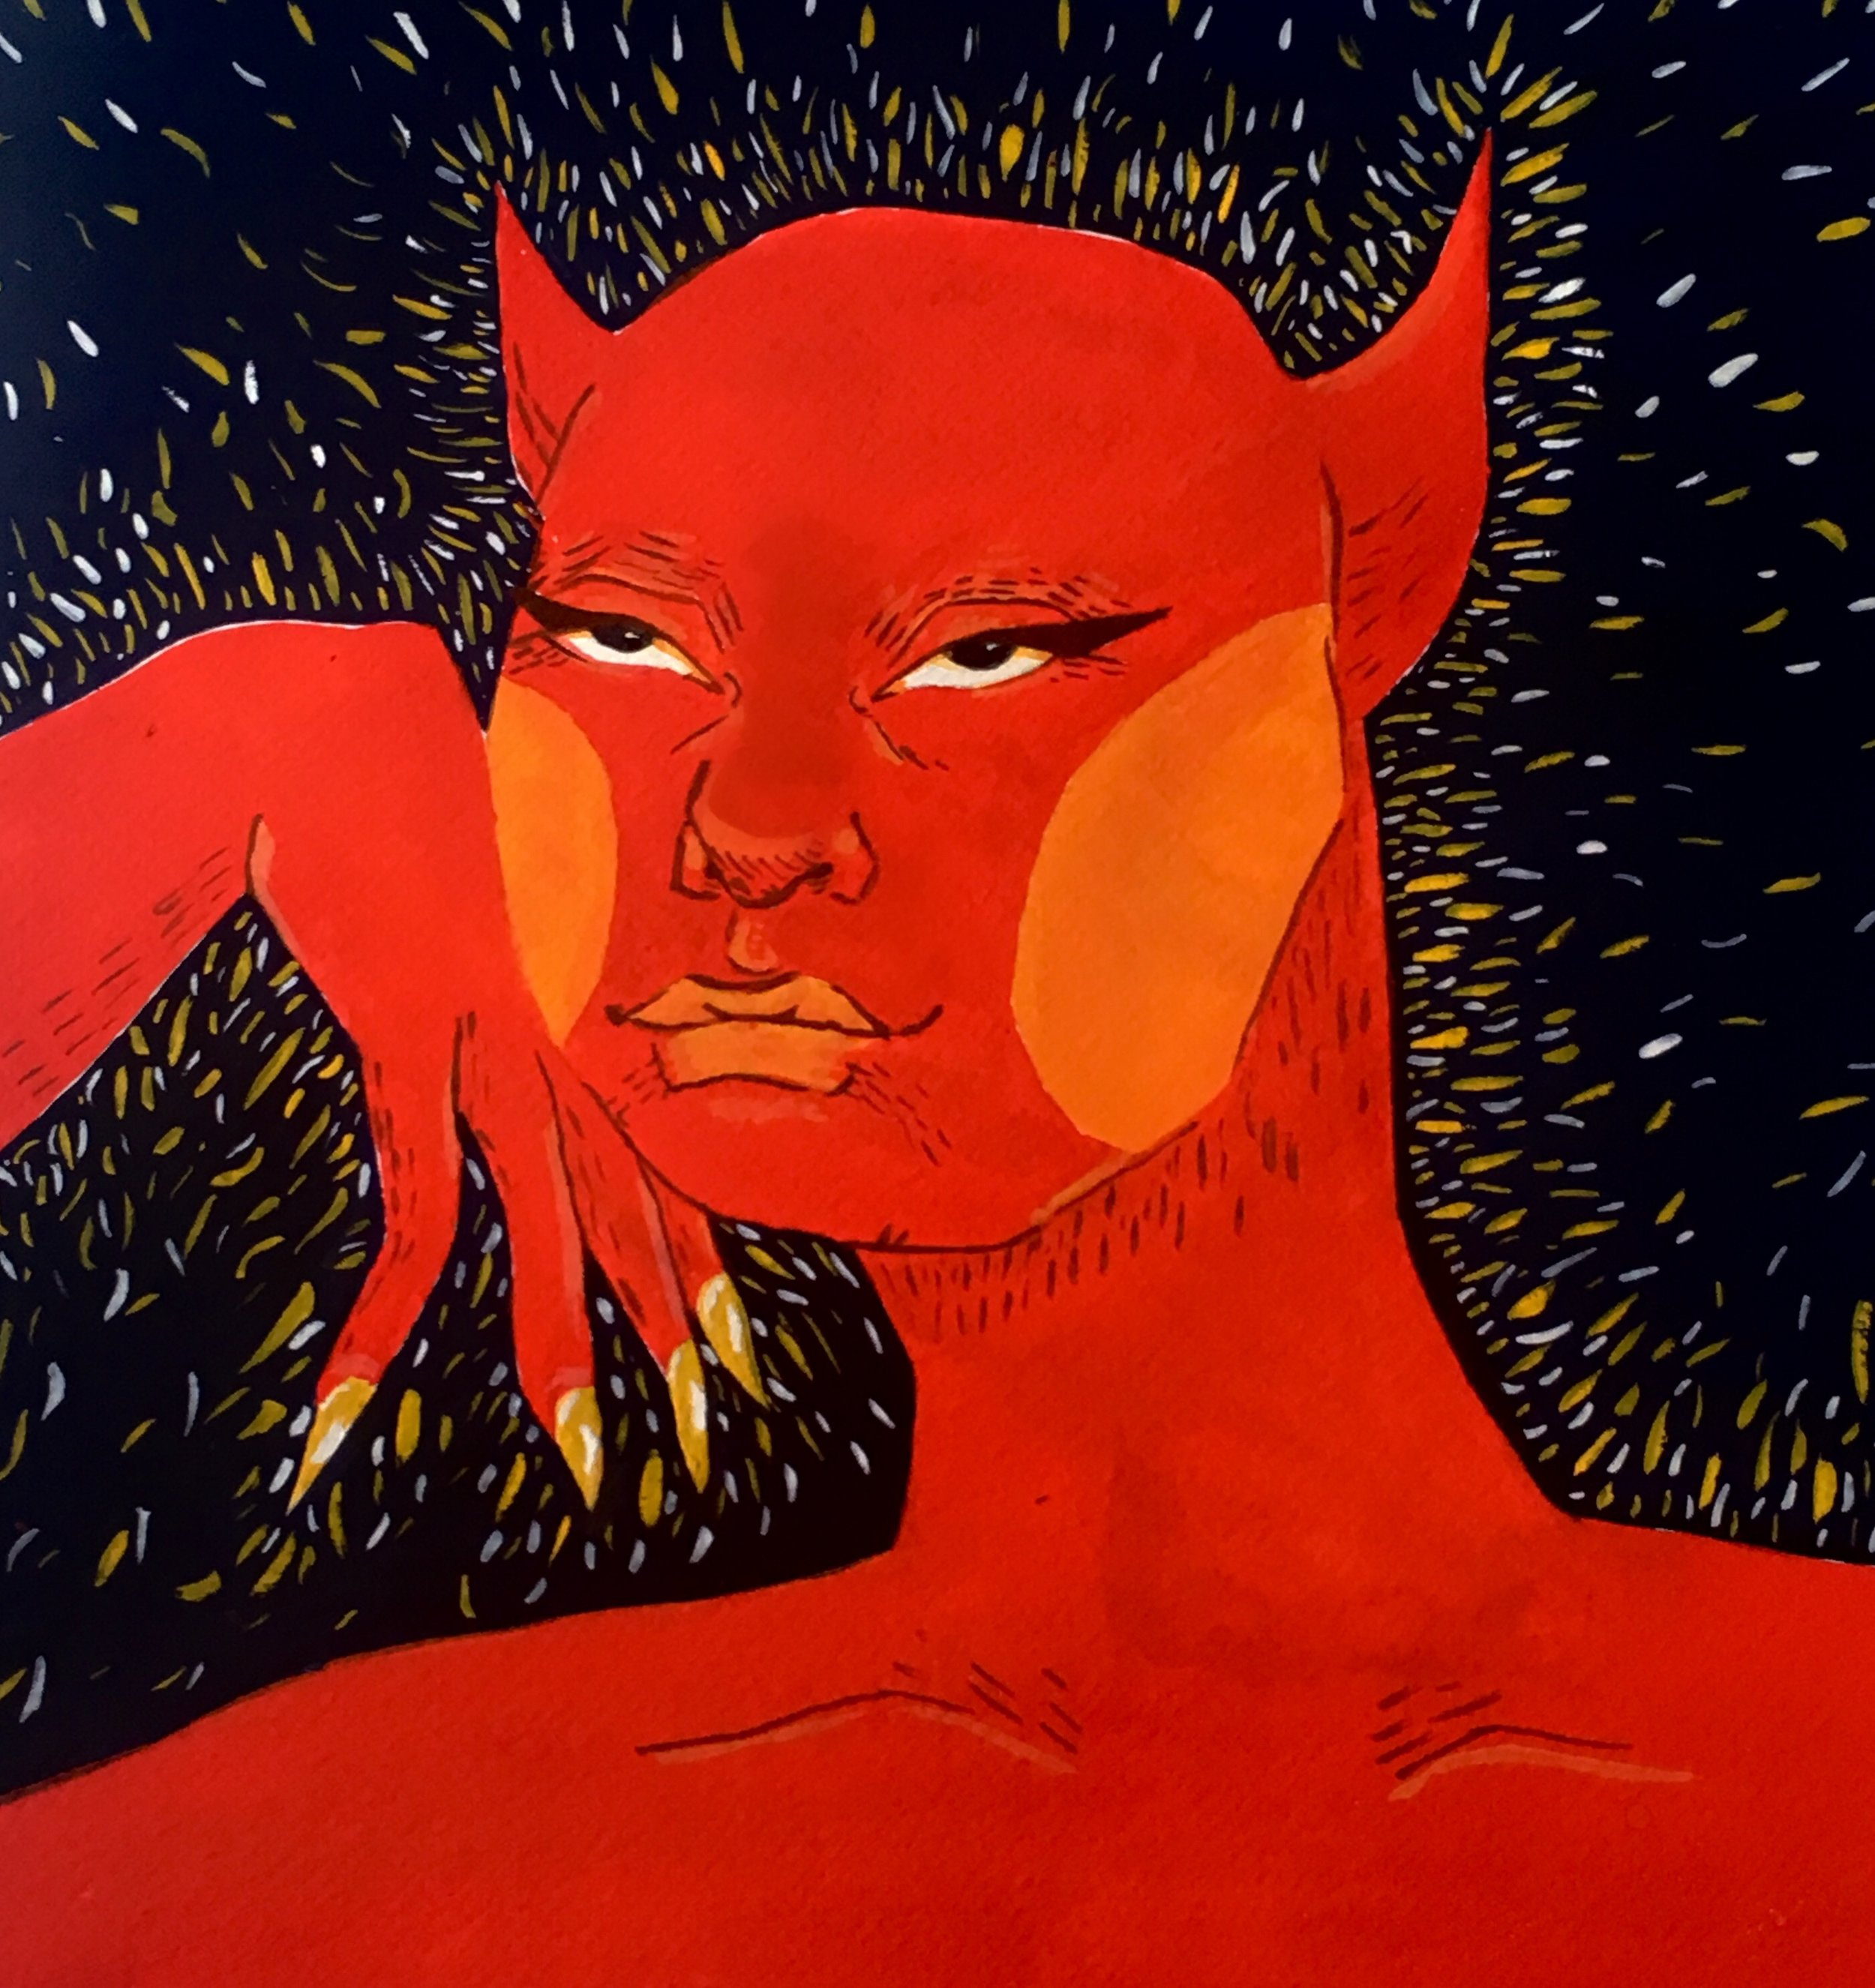 "A Sense of Self , Arlo Van Liew - 9"" x 12"" - Gouache - $100 starting bid"